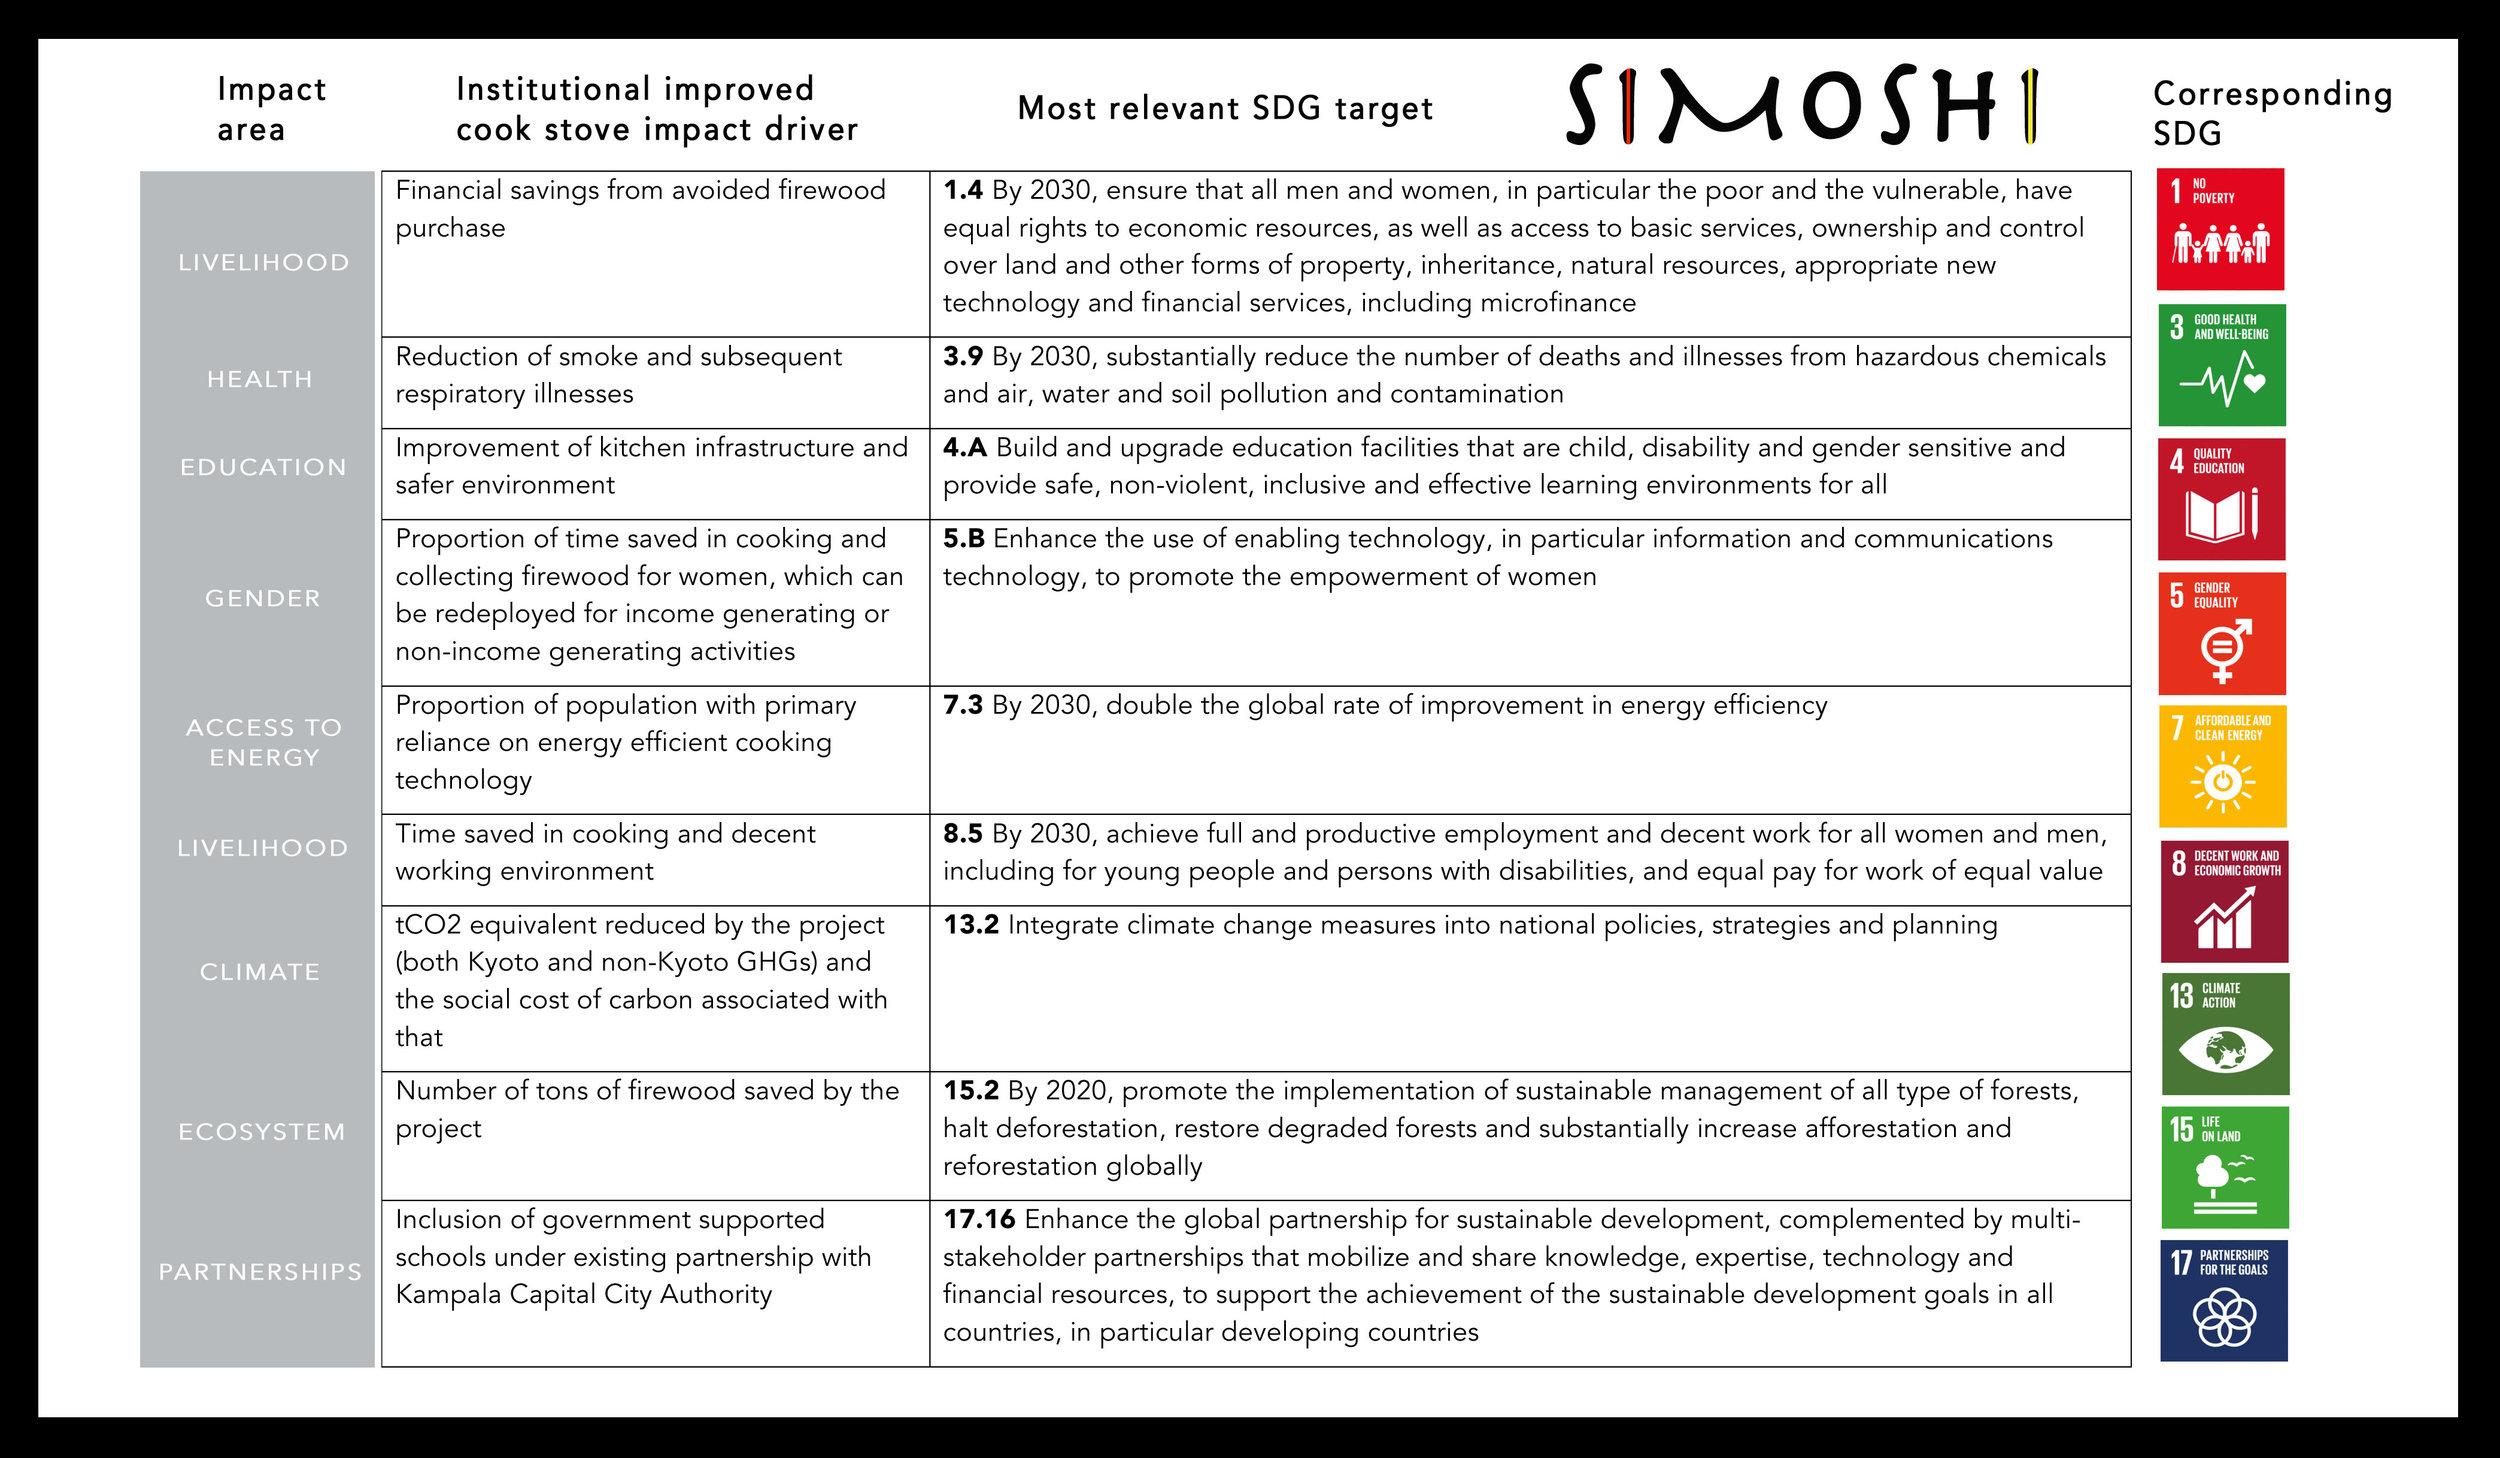 Simoshi_SDG Impact Area-1.jpg